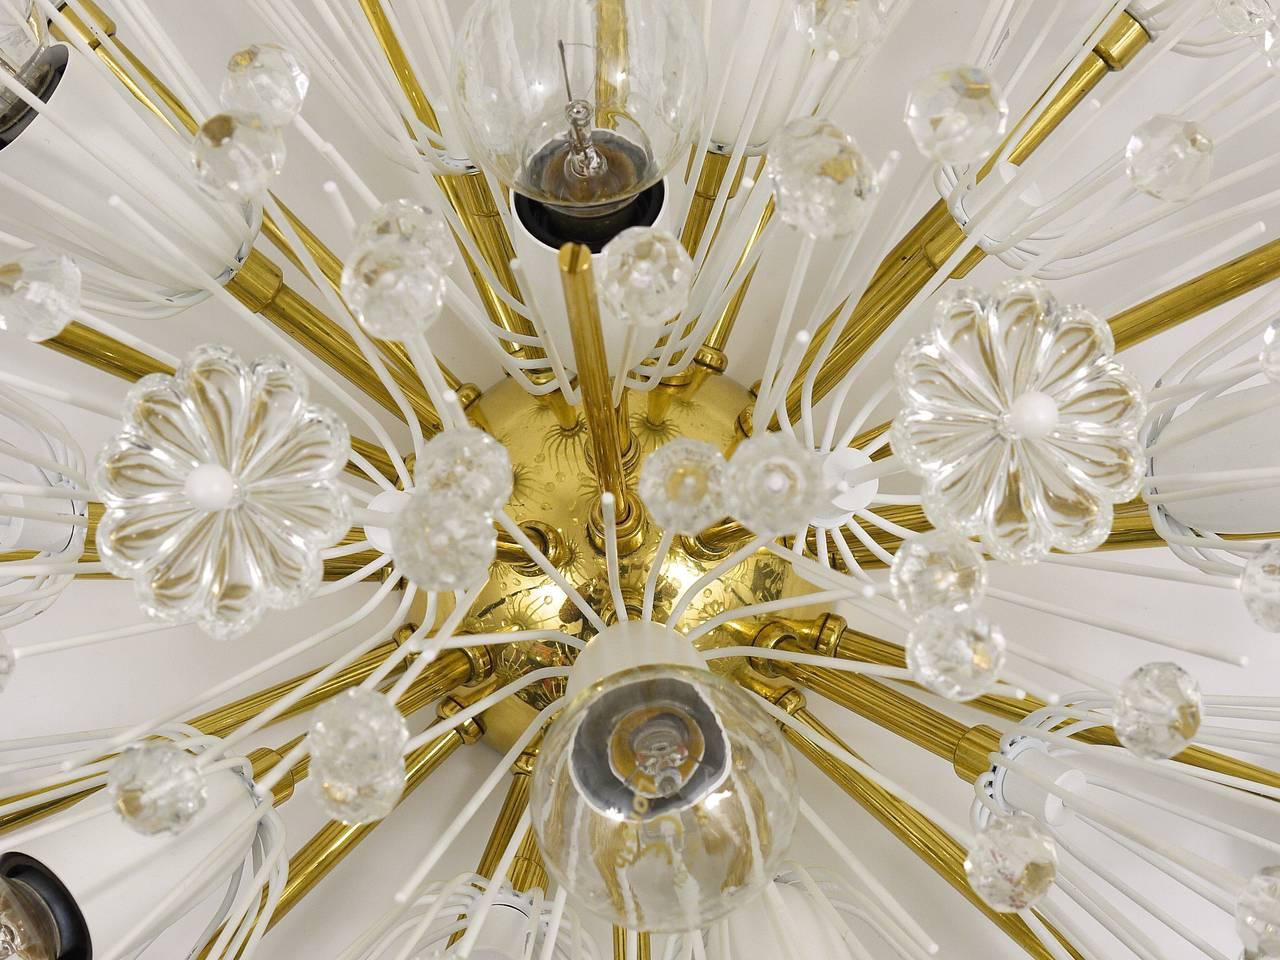 Austrian Emil Stejnar Brass Crystal Flush Mount or Sconce, Rupert Nikoll, 1950s For Sale 3